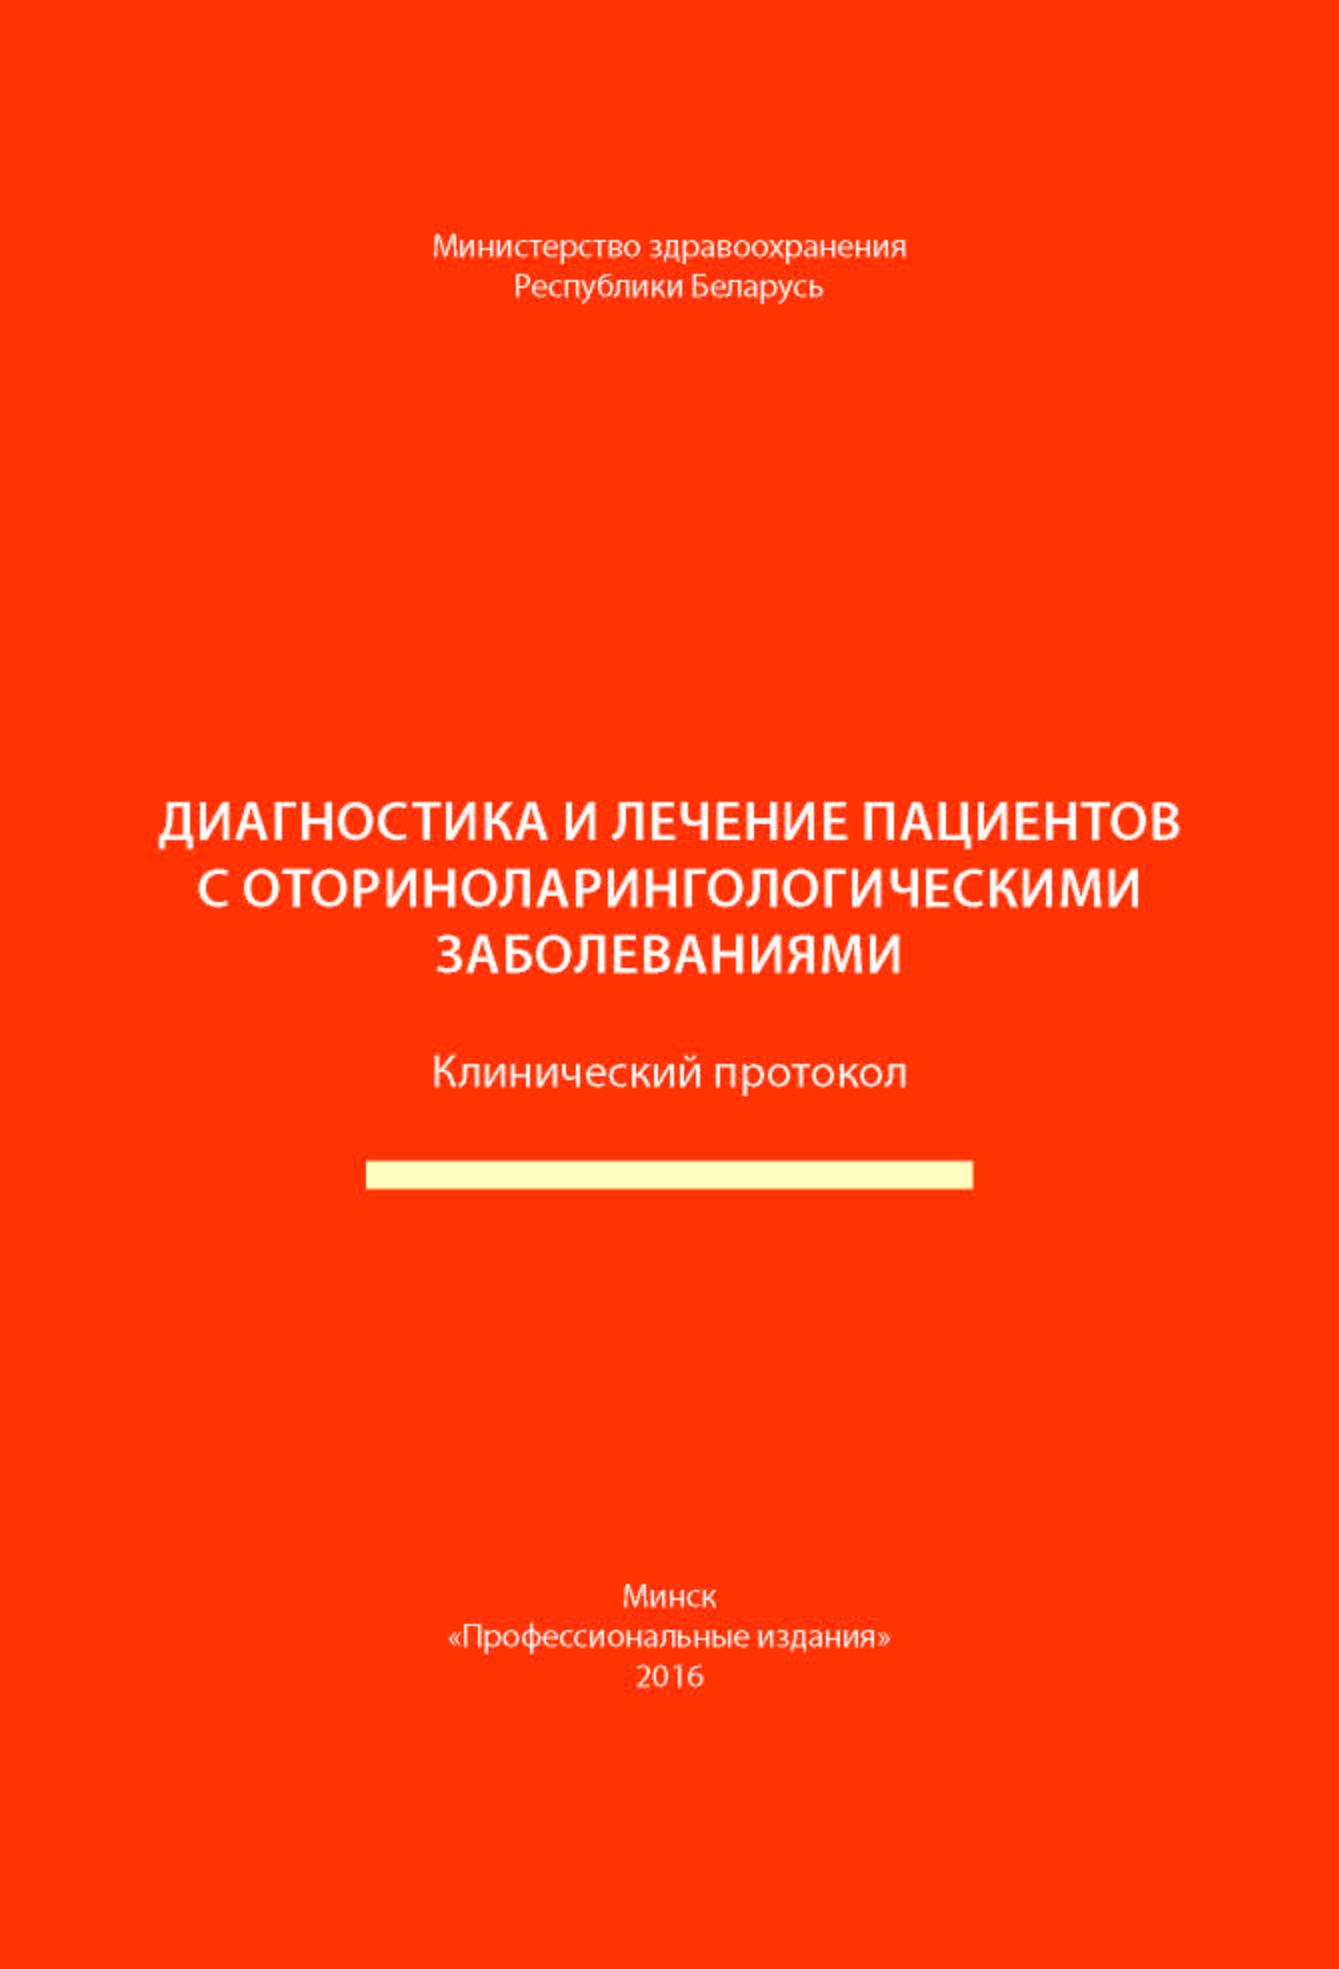 Обложка протоколы оторино.indd